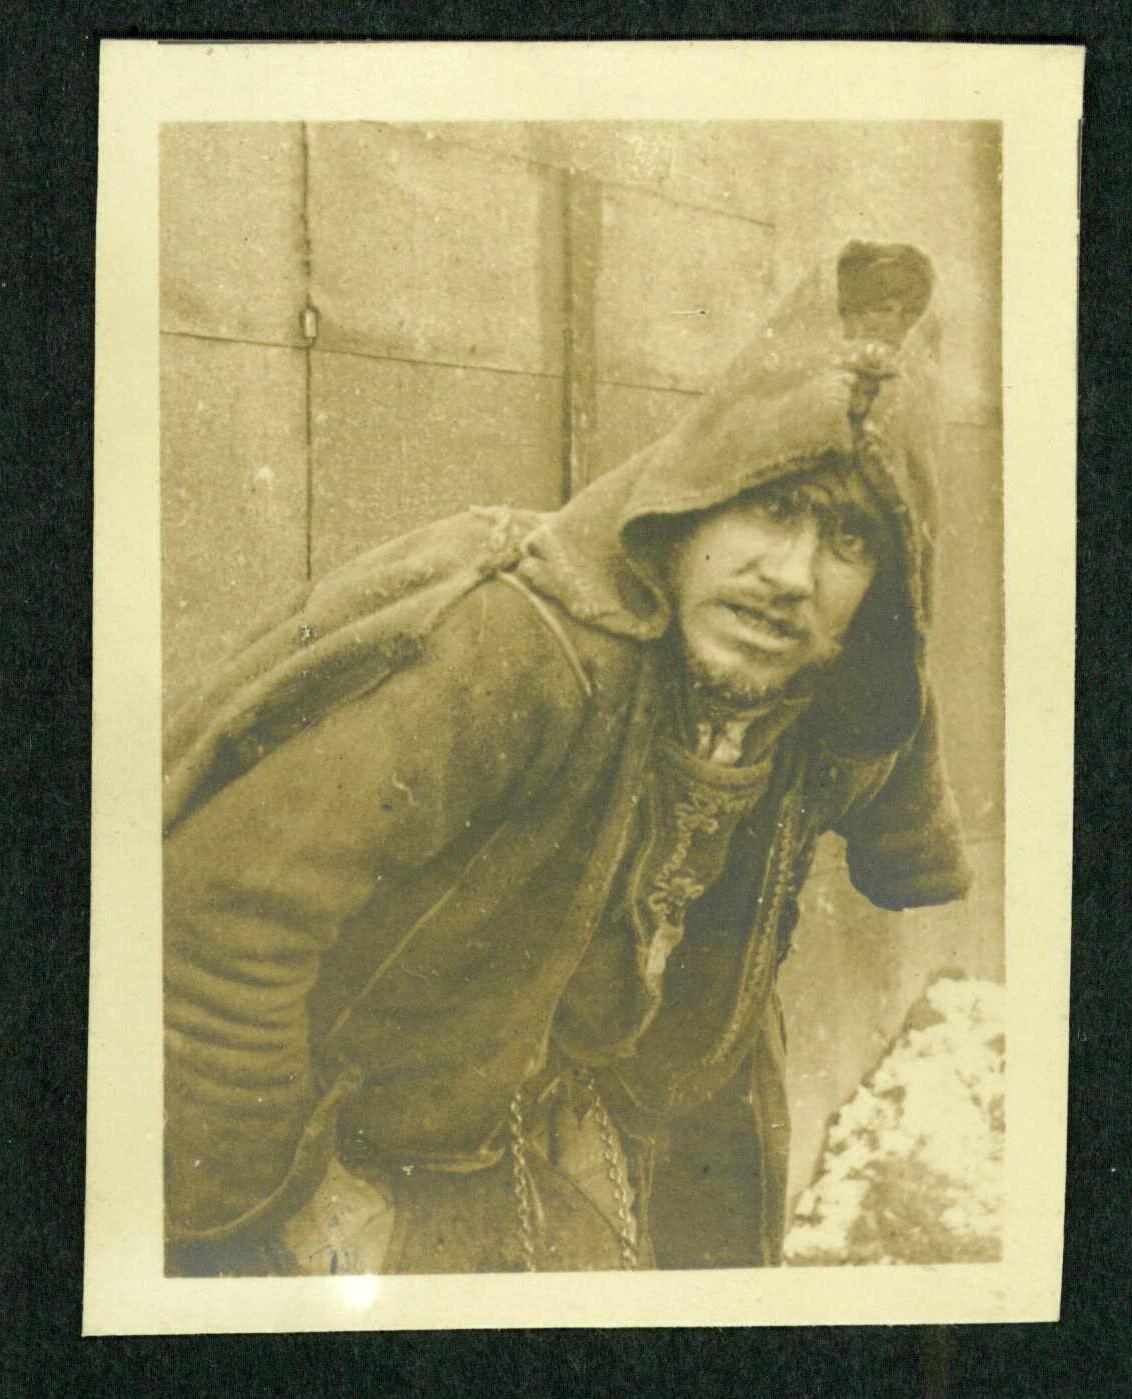 Zajatecký tábor Broumov, fotografie dr. Georga Langera, táborového lékaře